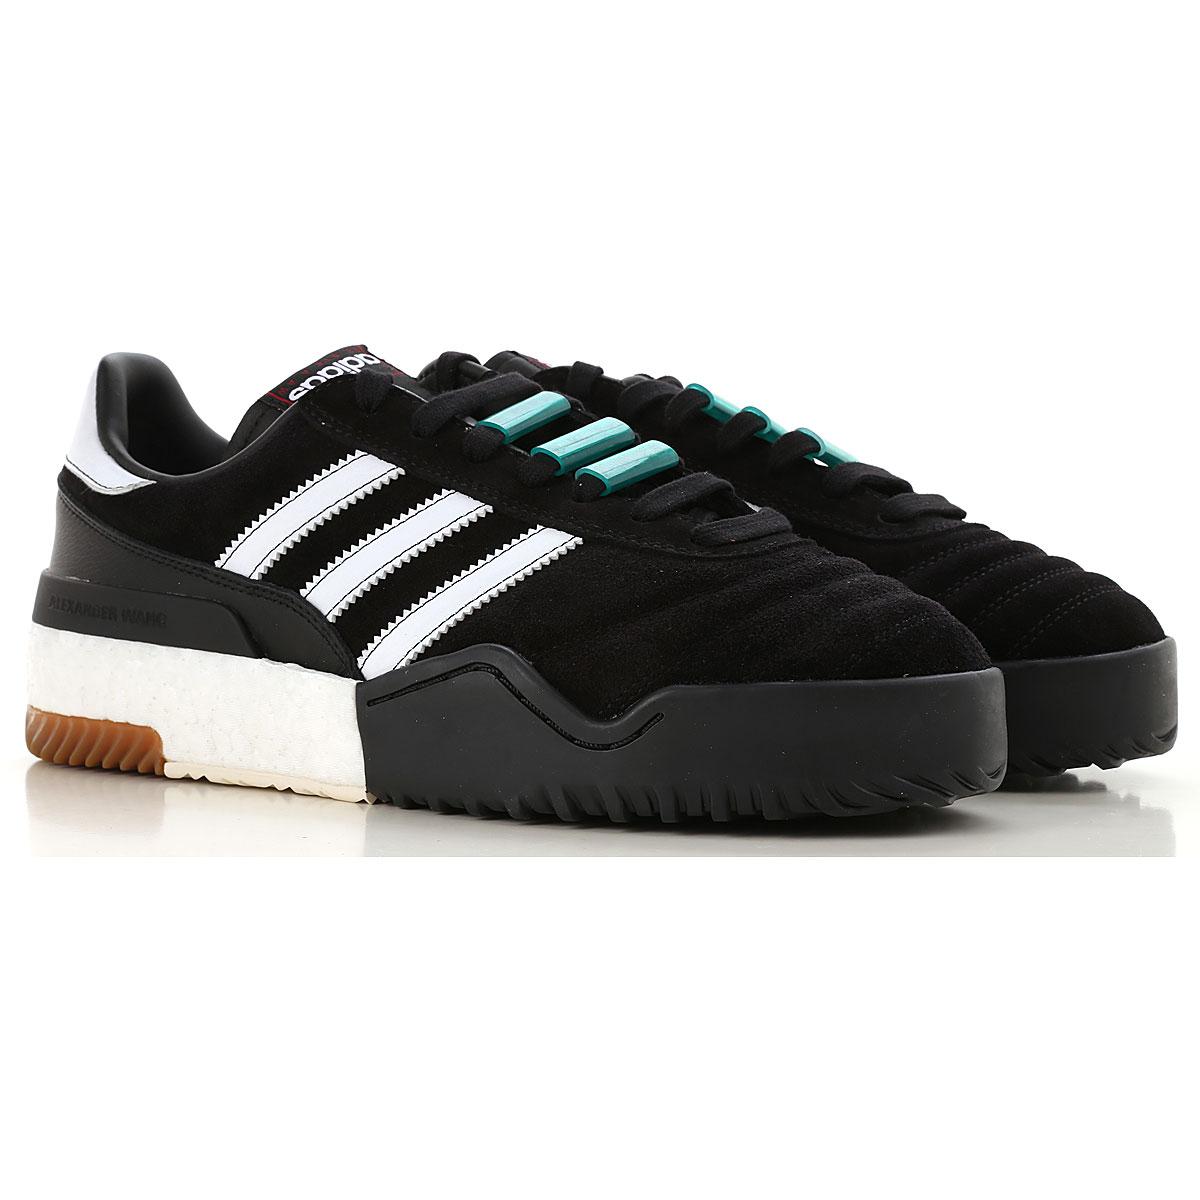 Image of Adidas Sneakers for Men, Black, Suede leather, 2017, US 7 - UK 6 - EUR 40 US 7.5 - UK 7 - EU 40.5 US 8 - UK 7.5 - EU 41